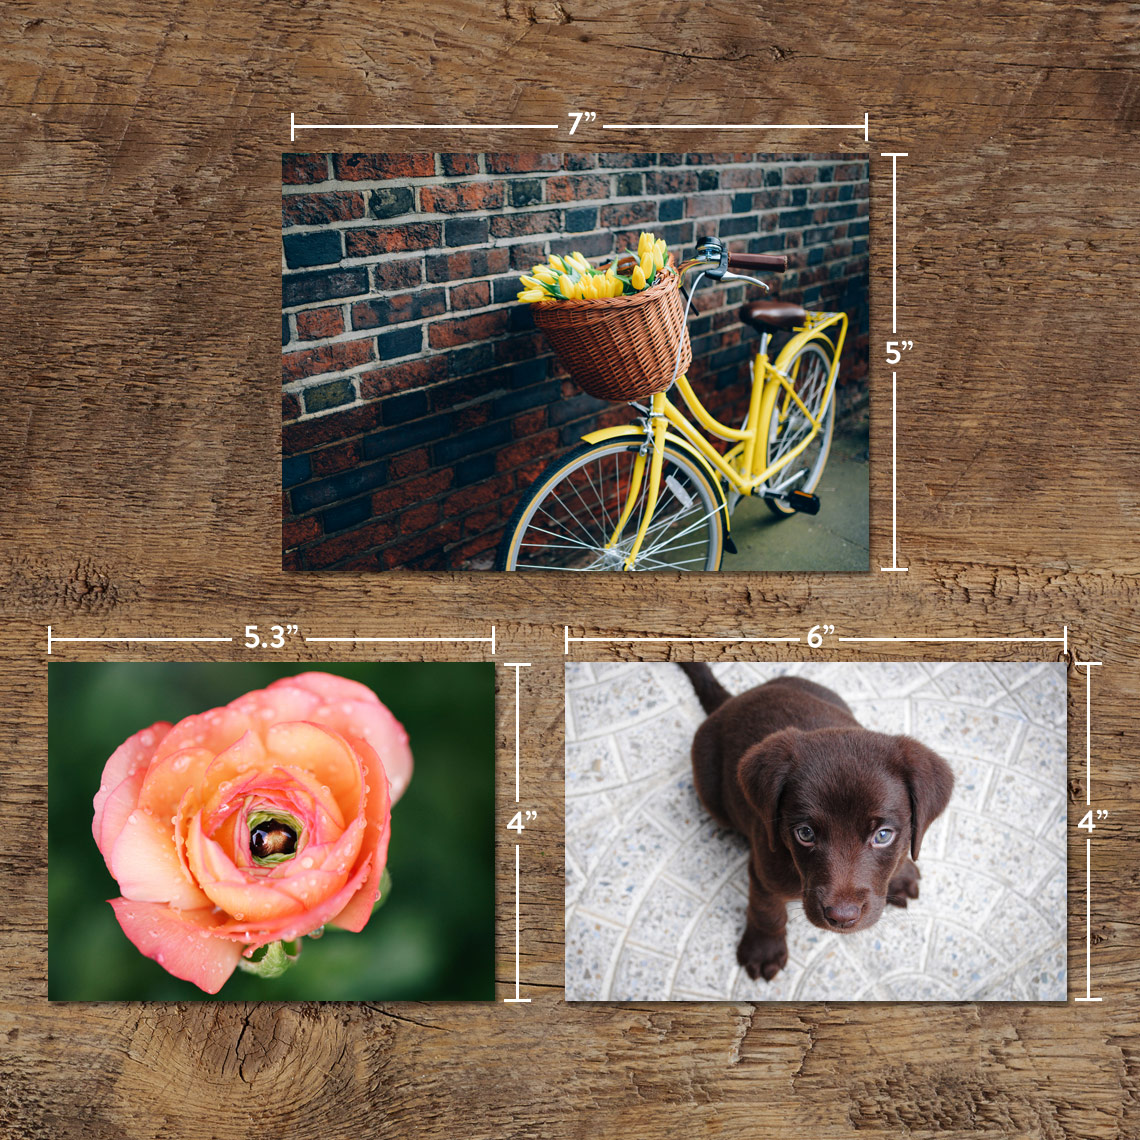 7x5 18x13cm photo prints gloss finish regular prints prints